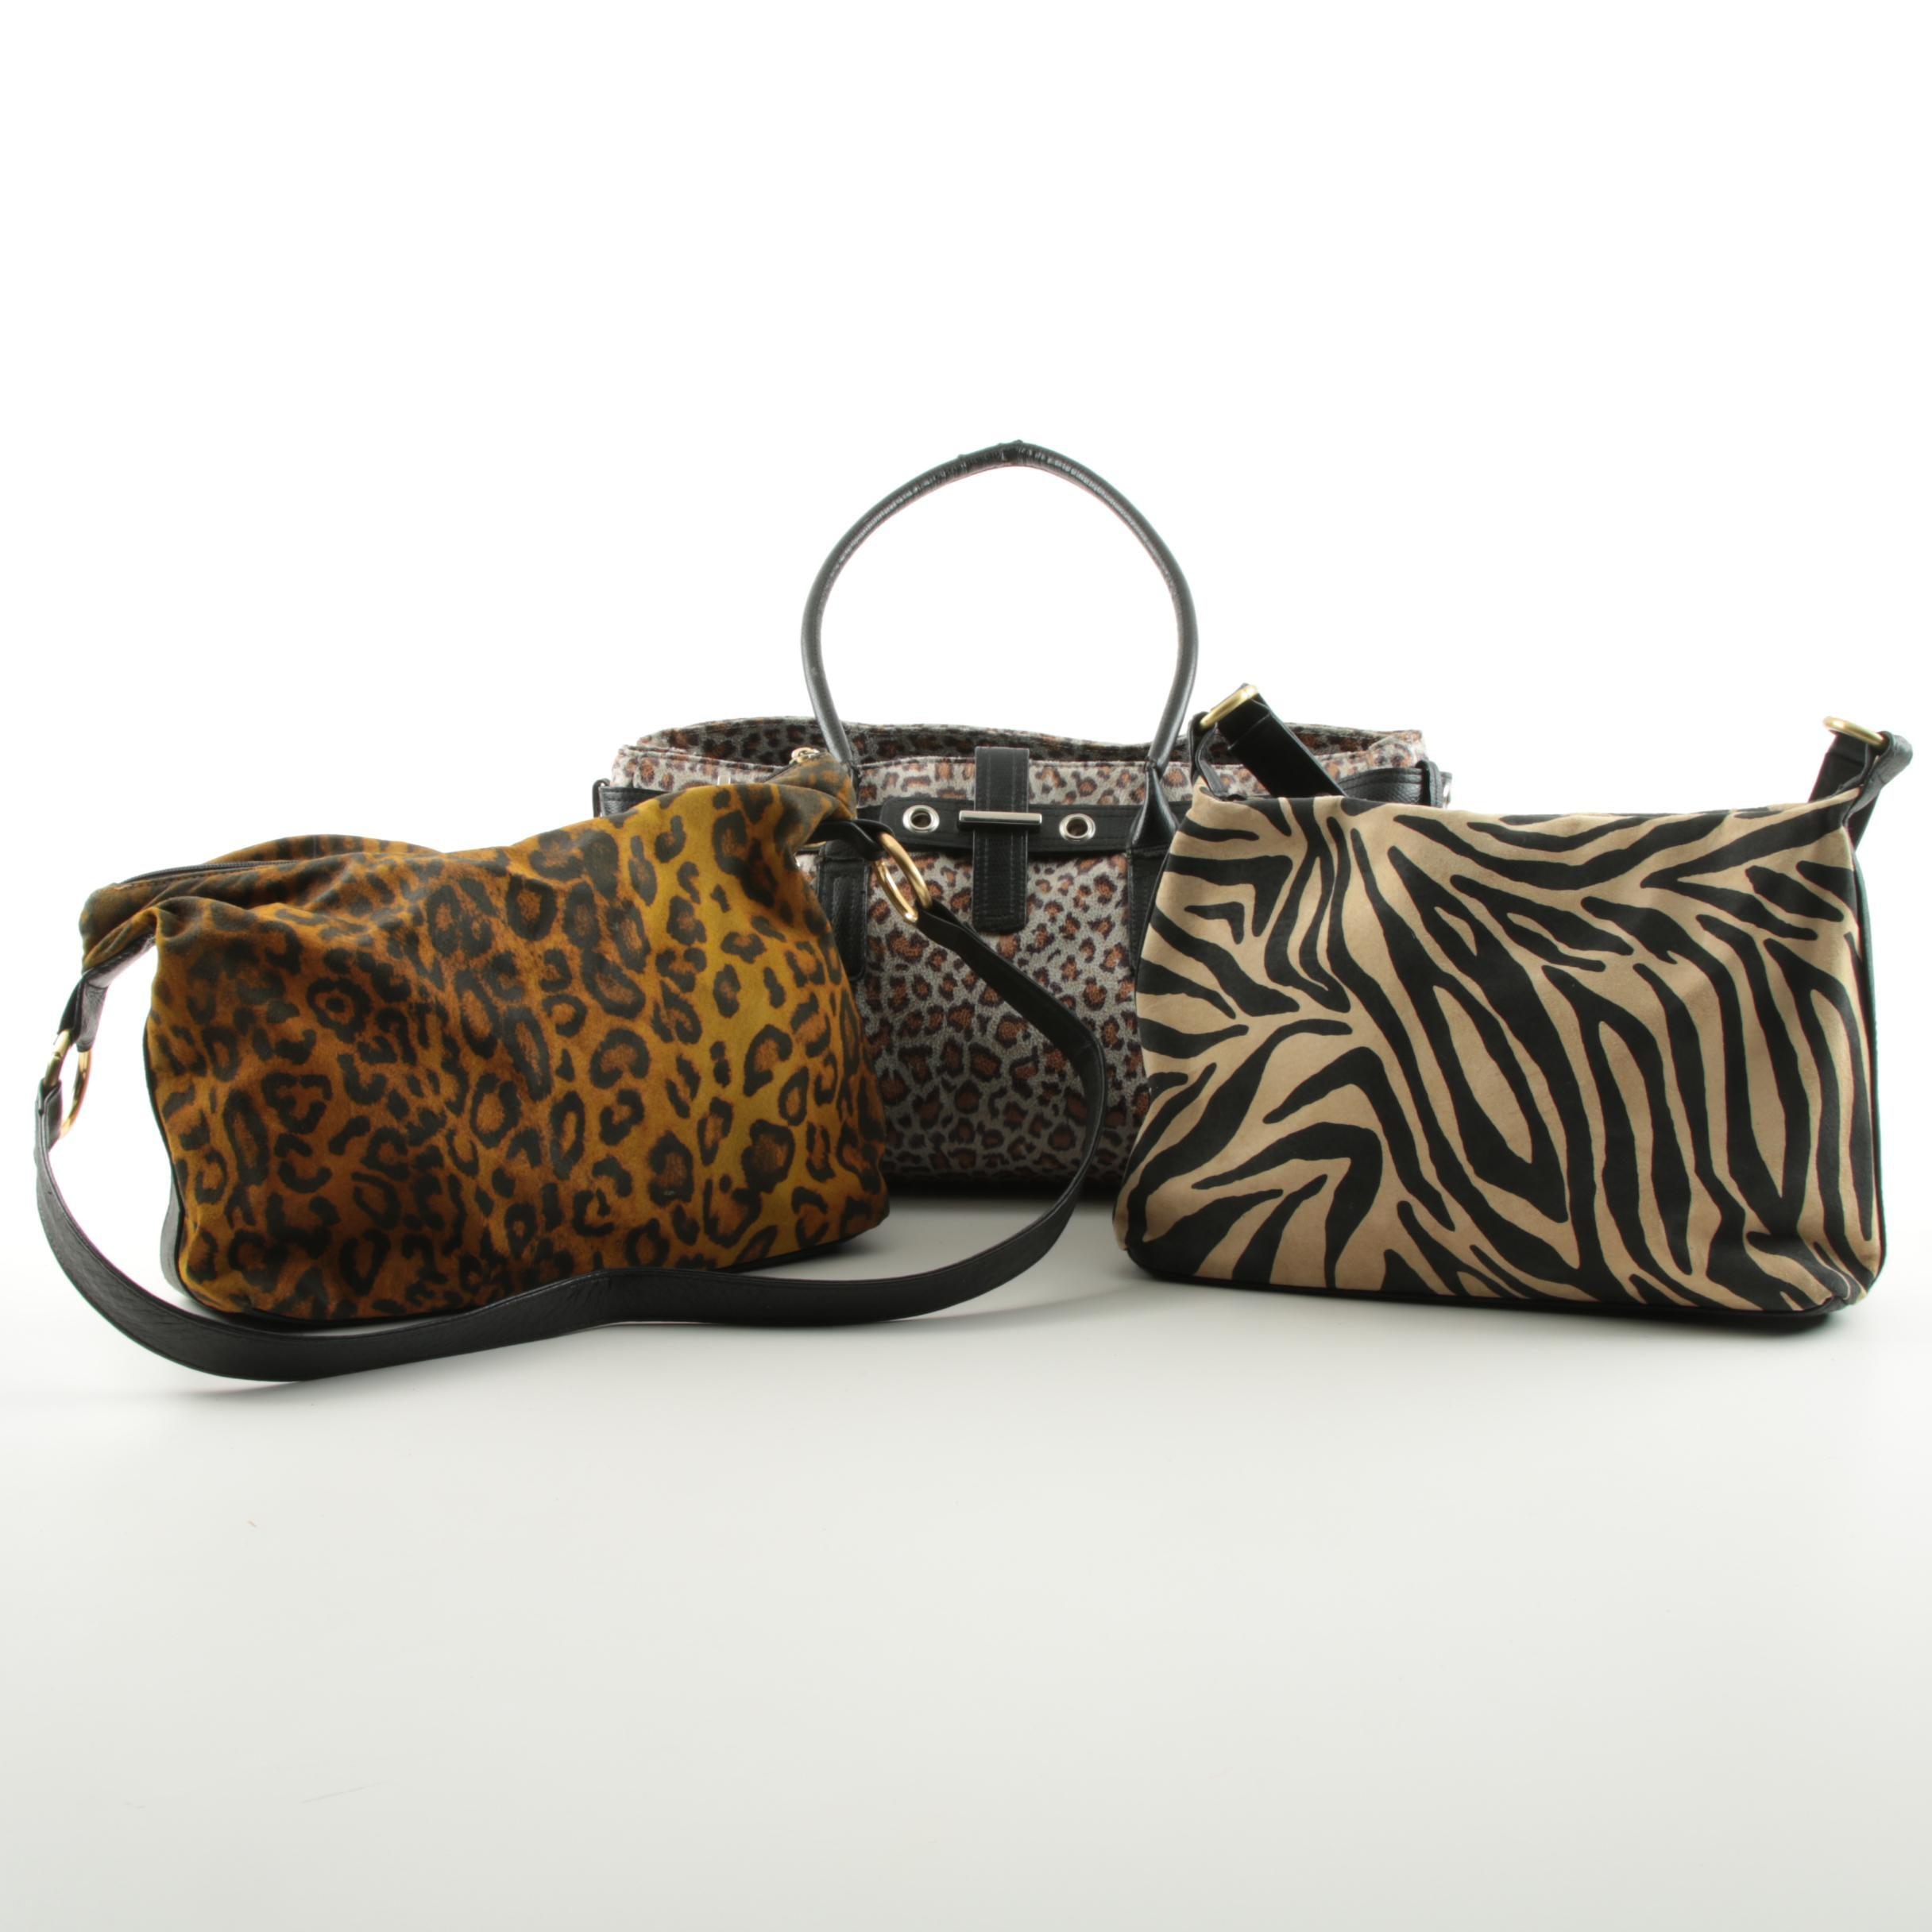 Animal Print Handbag Variety